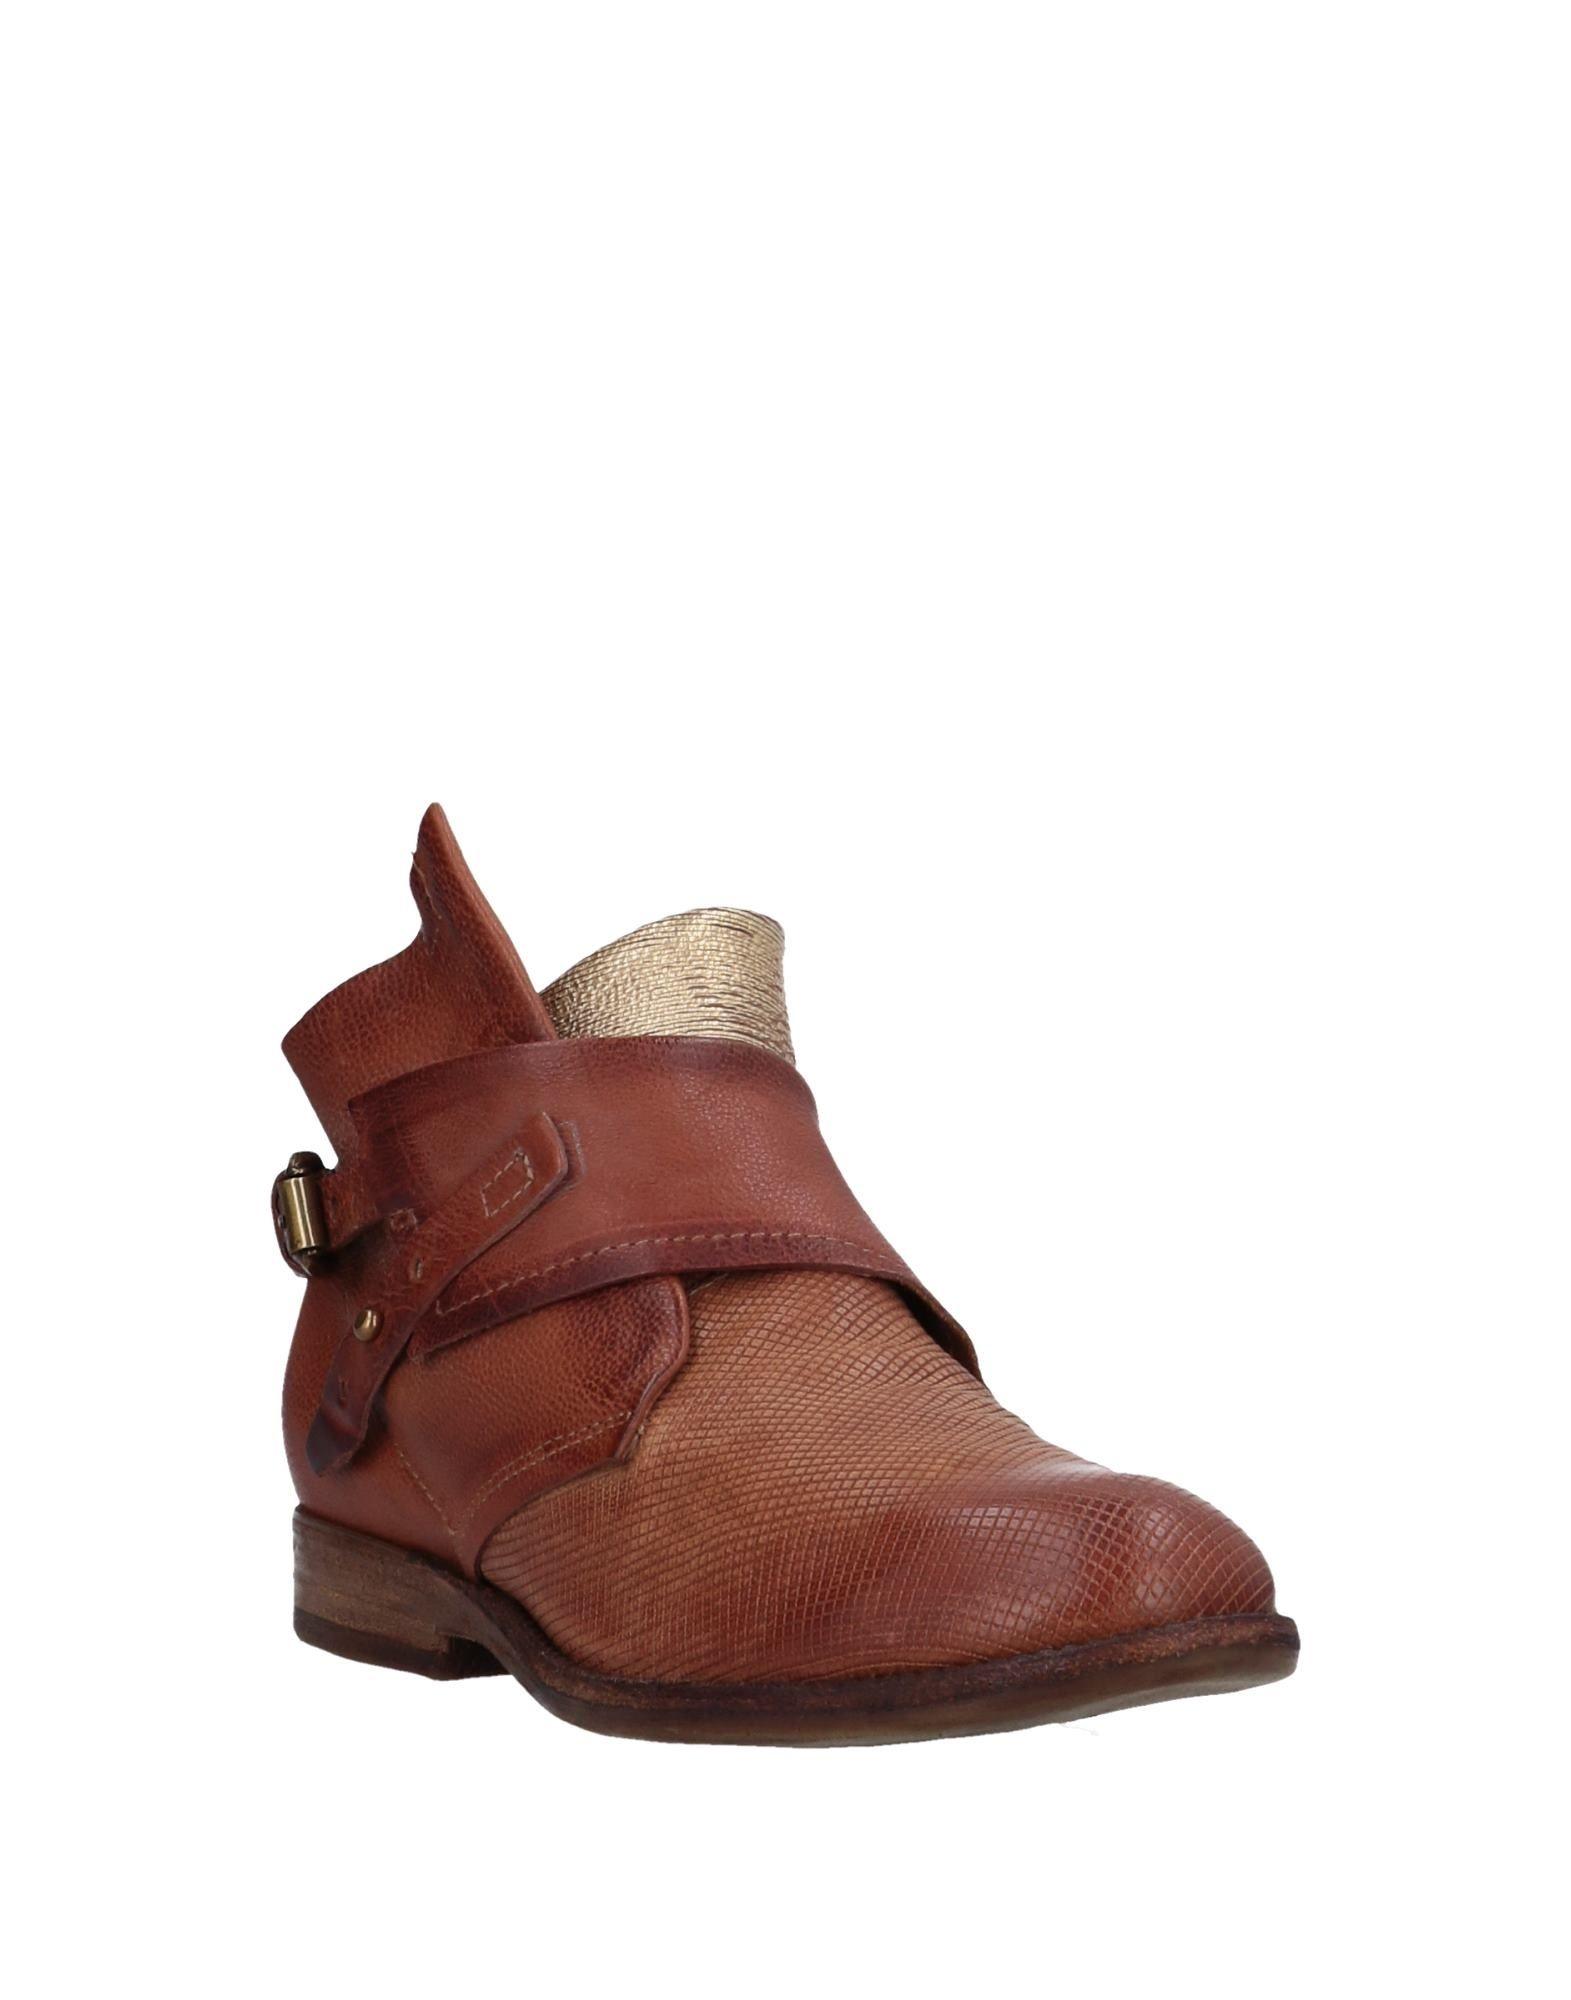 Stilvolle billige Damen Schuhe A.S. 98 Stiefelette Damen billige  11517616DH 1ed77f